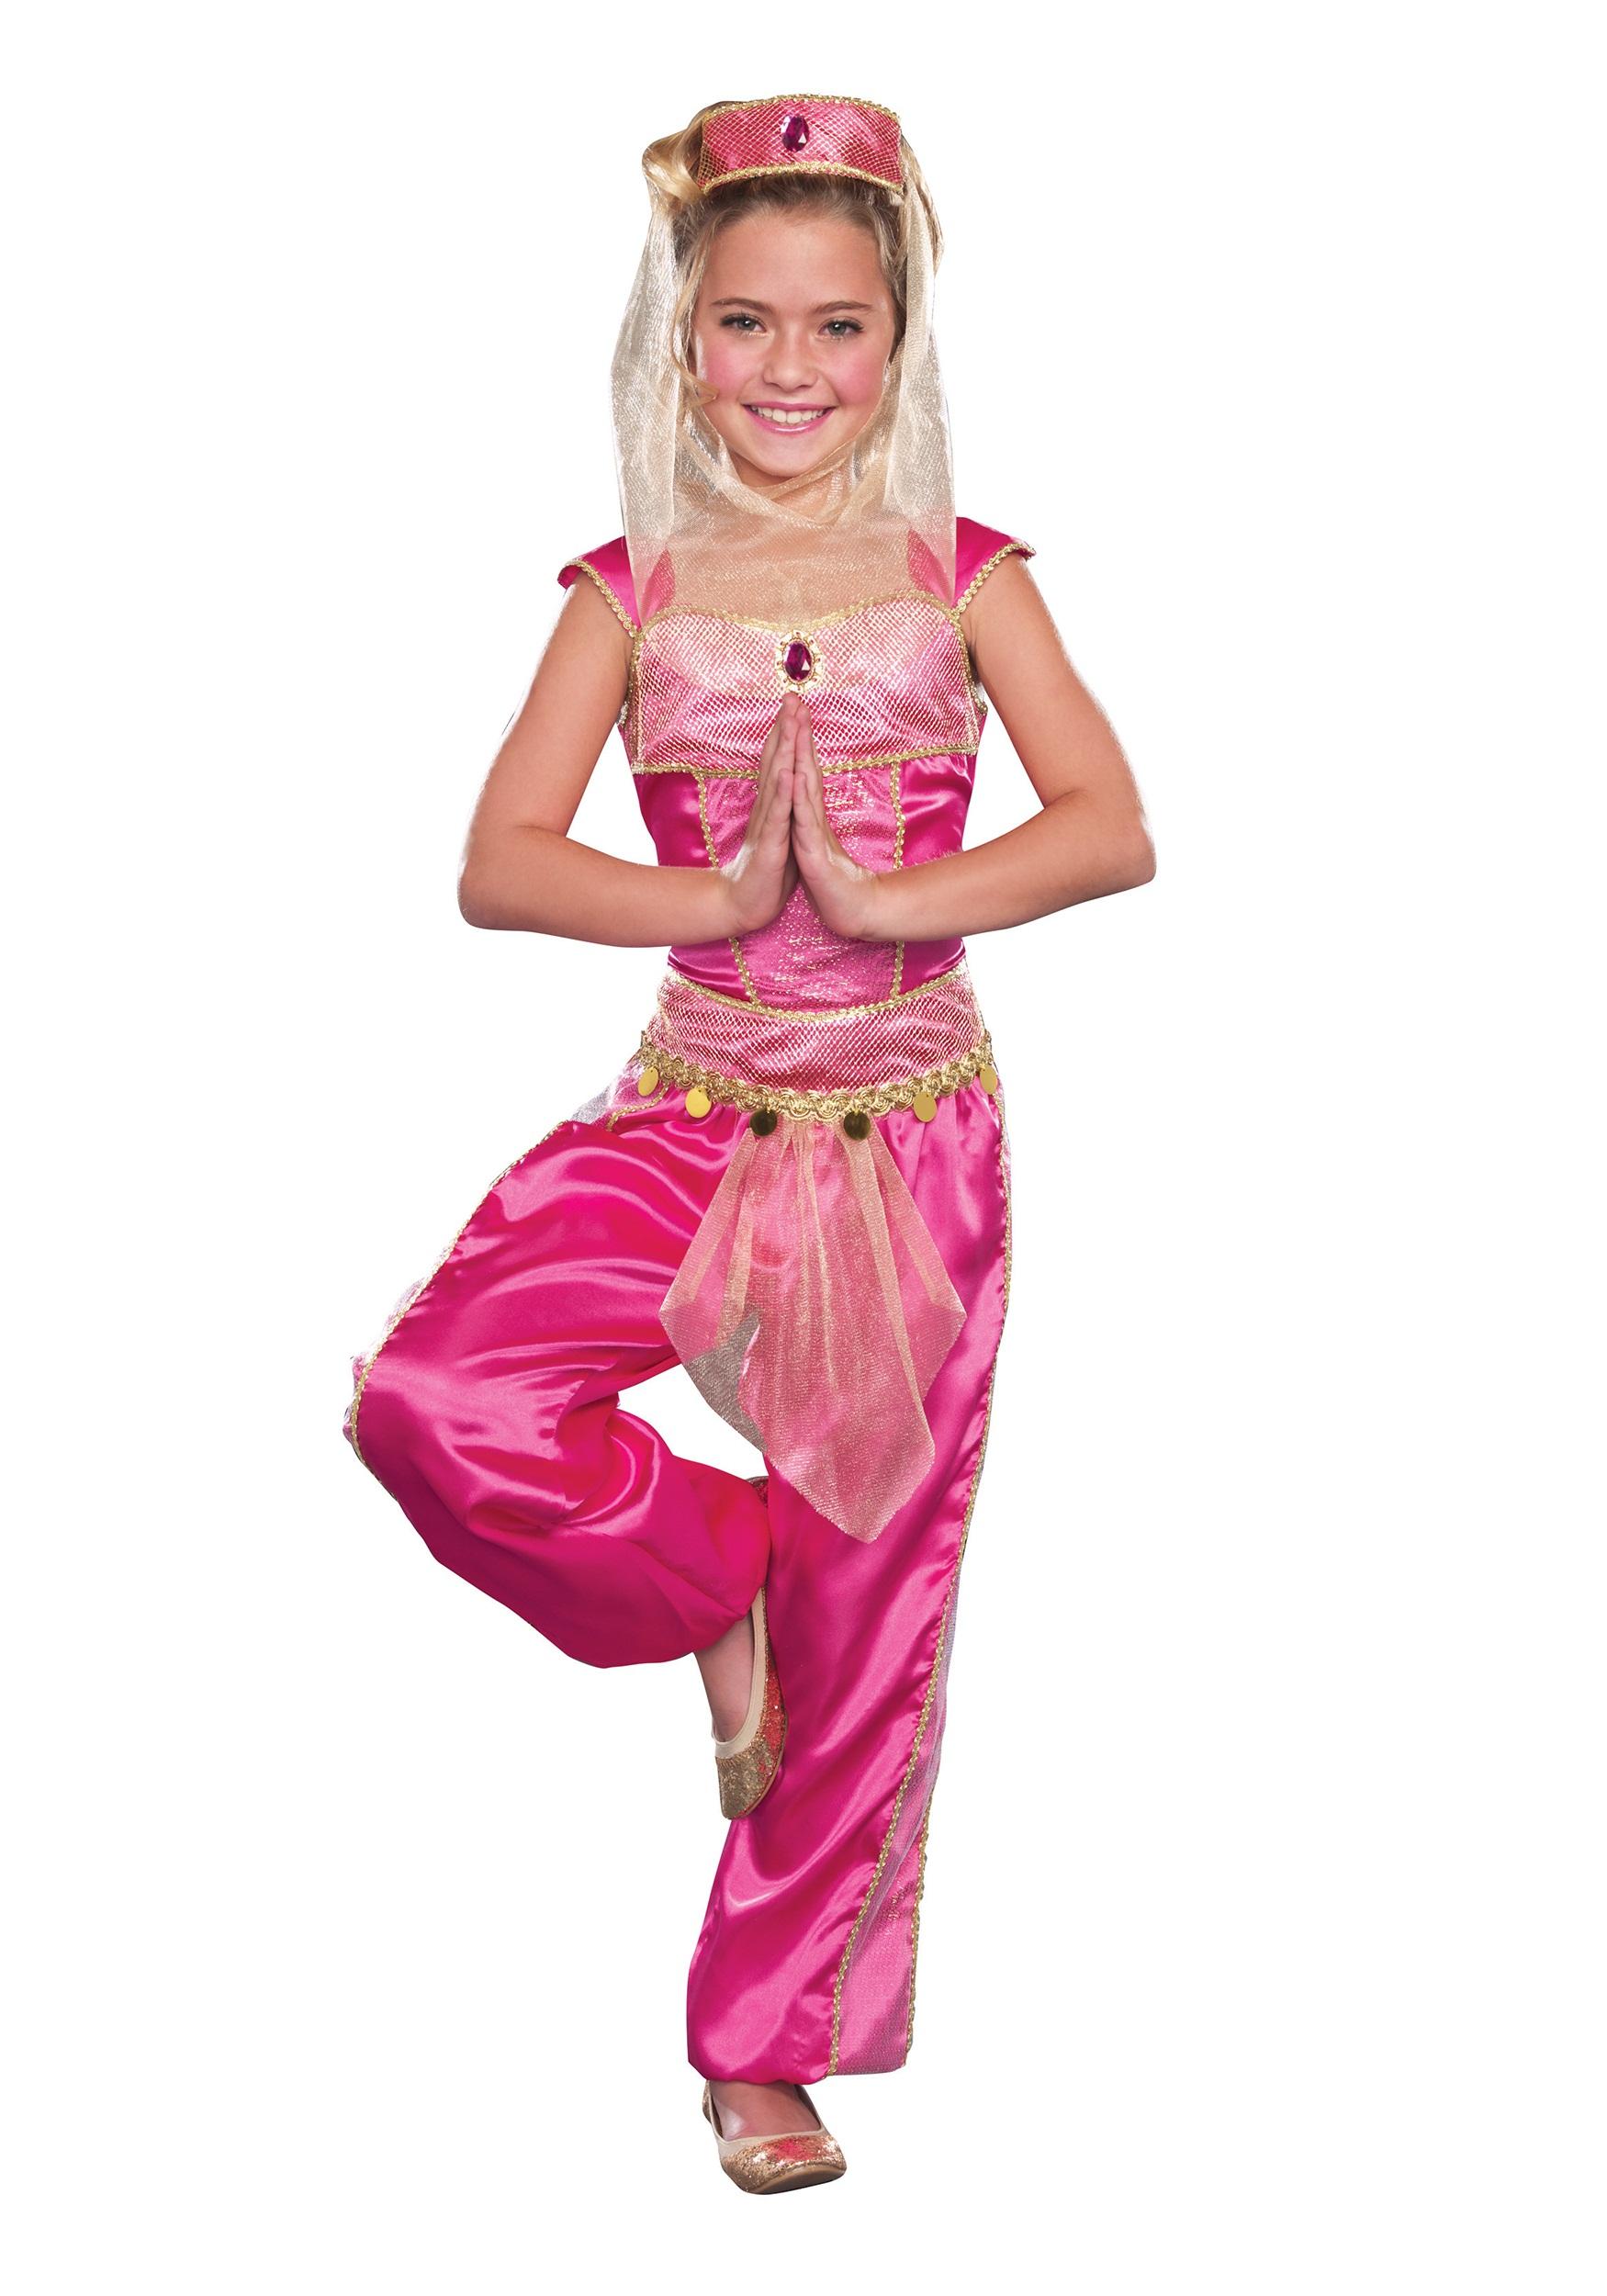 Girls Dream Genie Costume  sc 1 st  Halloween Costumes & Girls Dream Genie Costume - Halloween Costumes